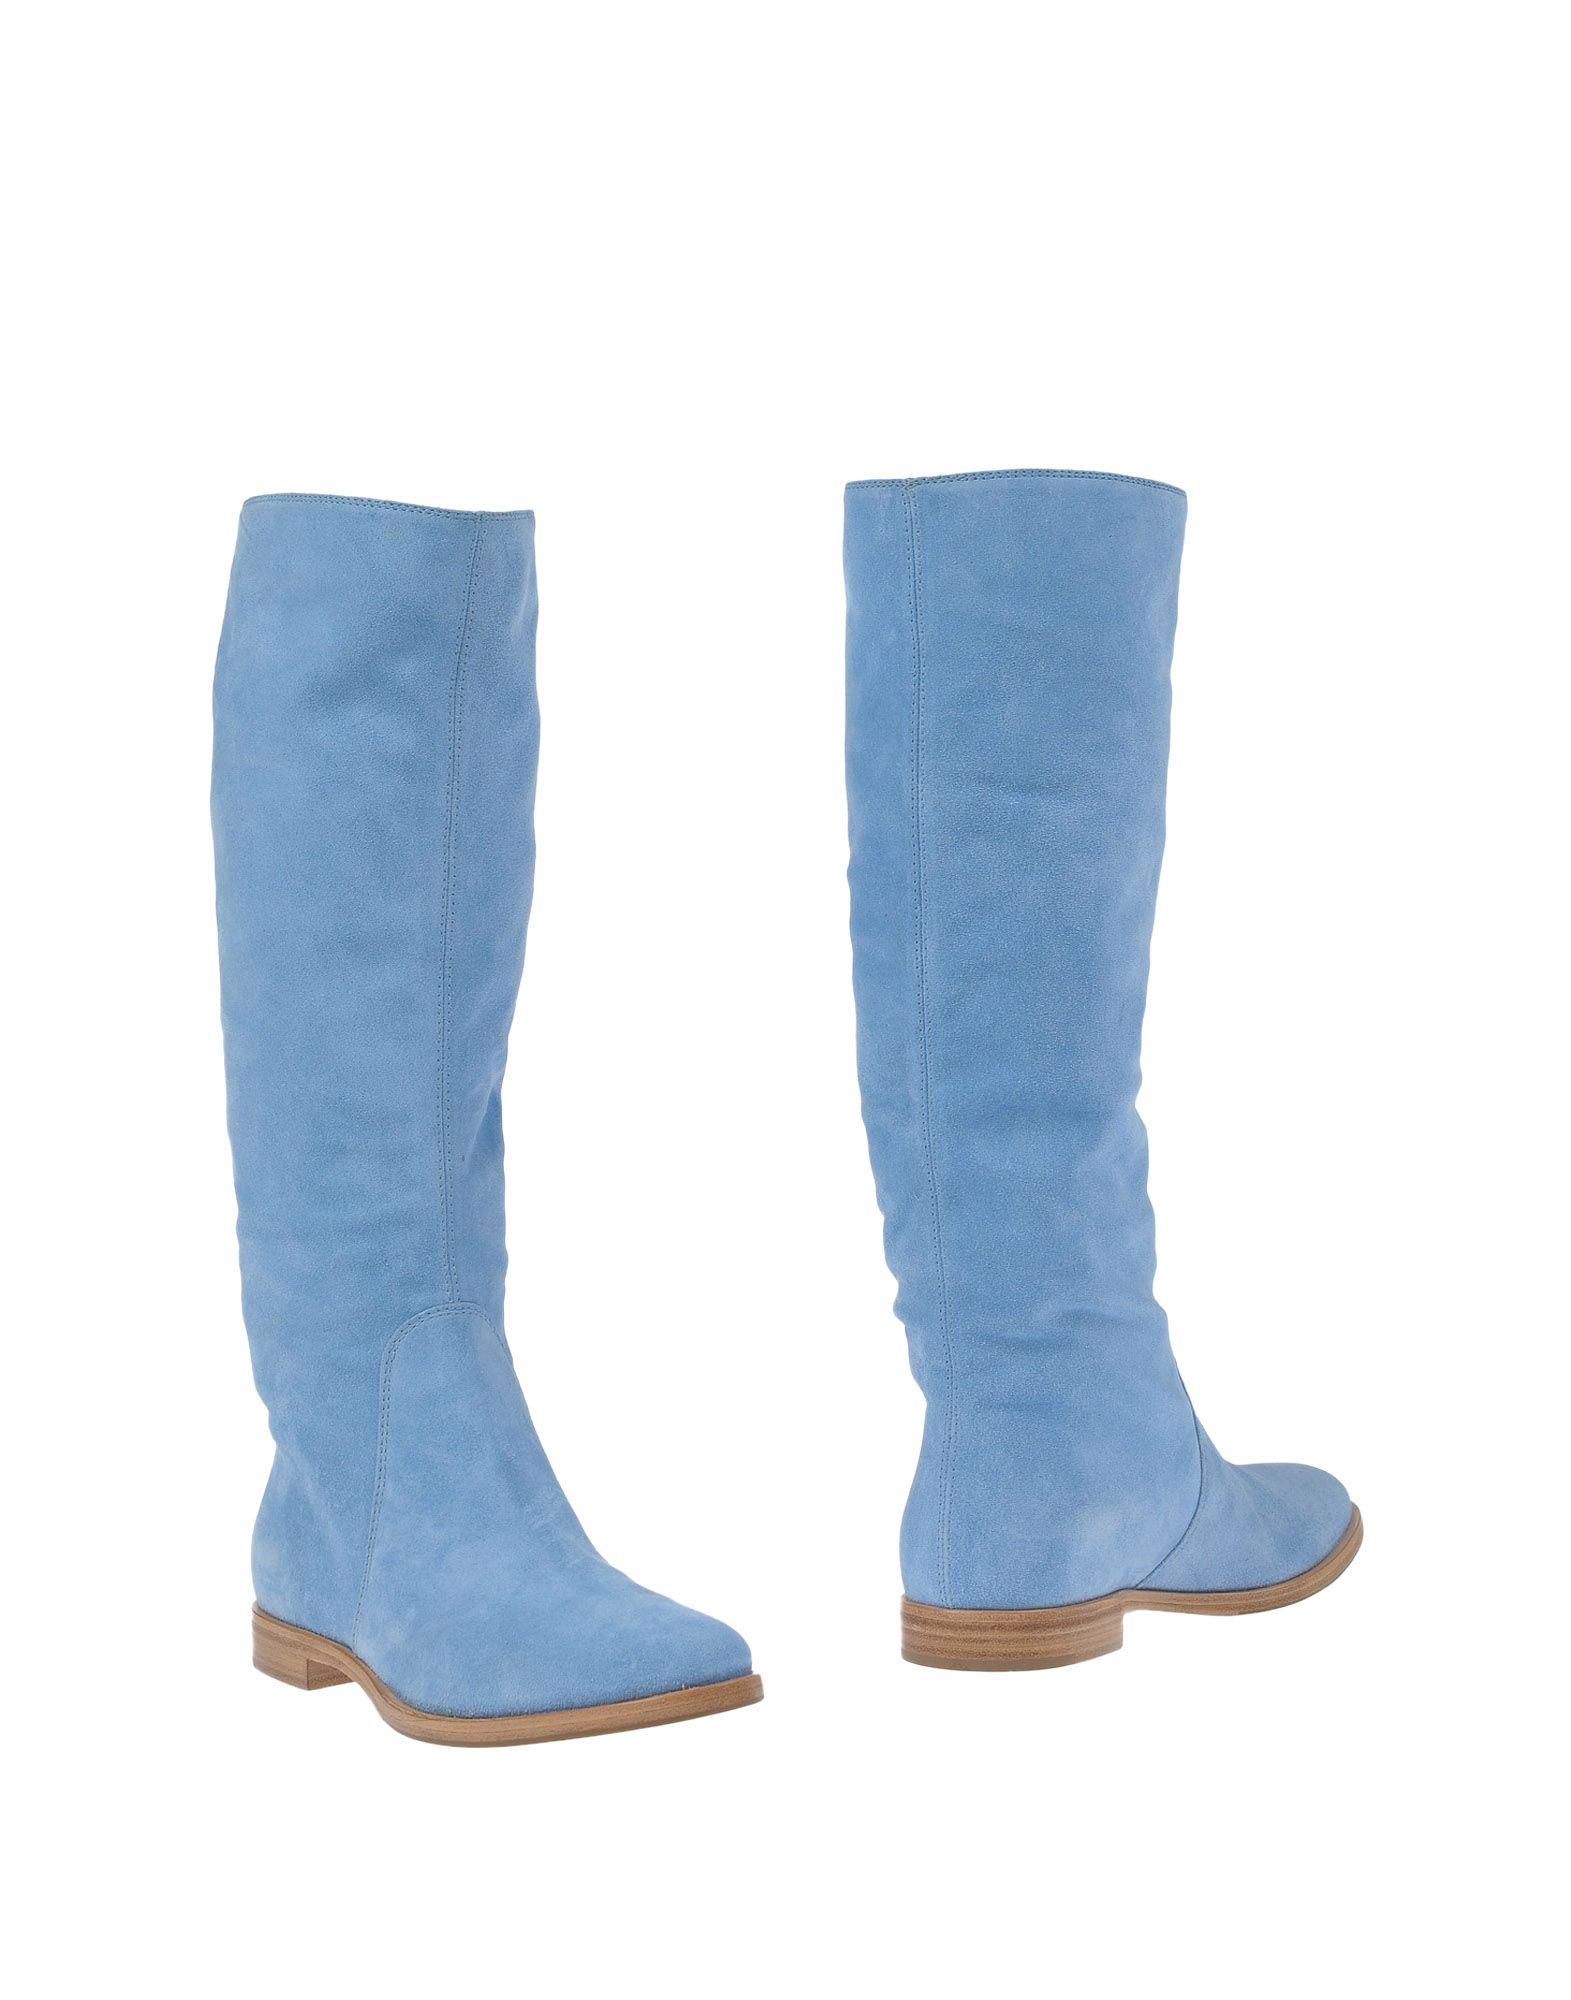 Sergio Rossi Boots - Women Sergio Rossi Boots Kingdom online on  United Kingdom Boots - 11284941KX 86007d